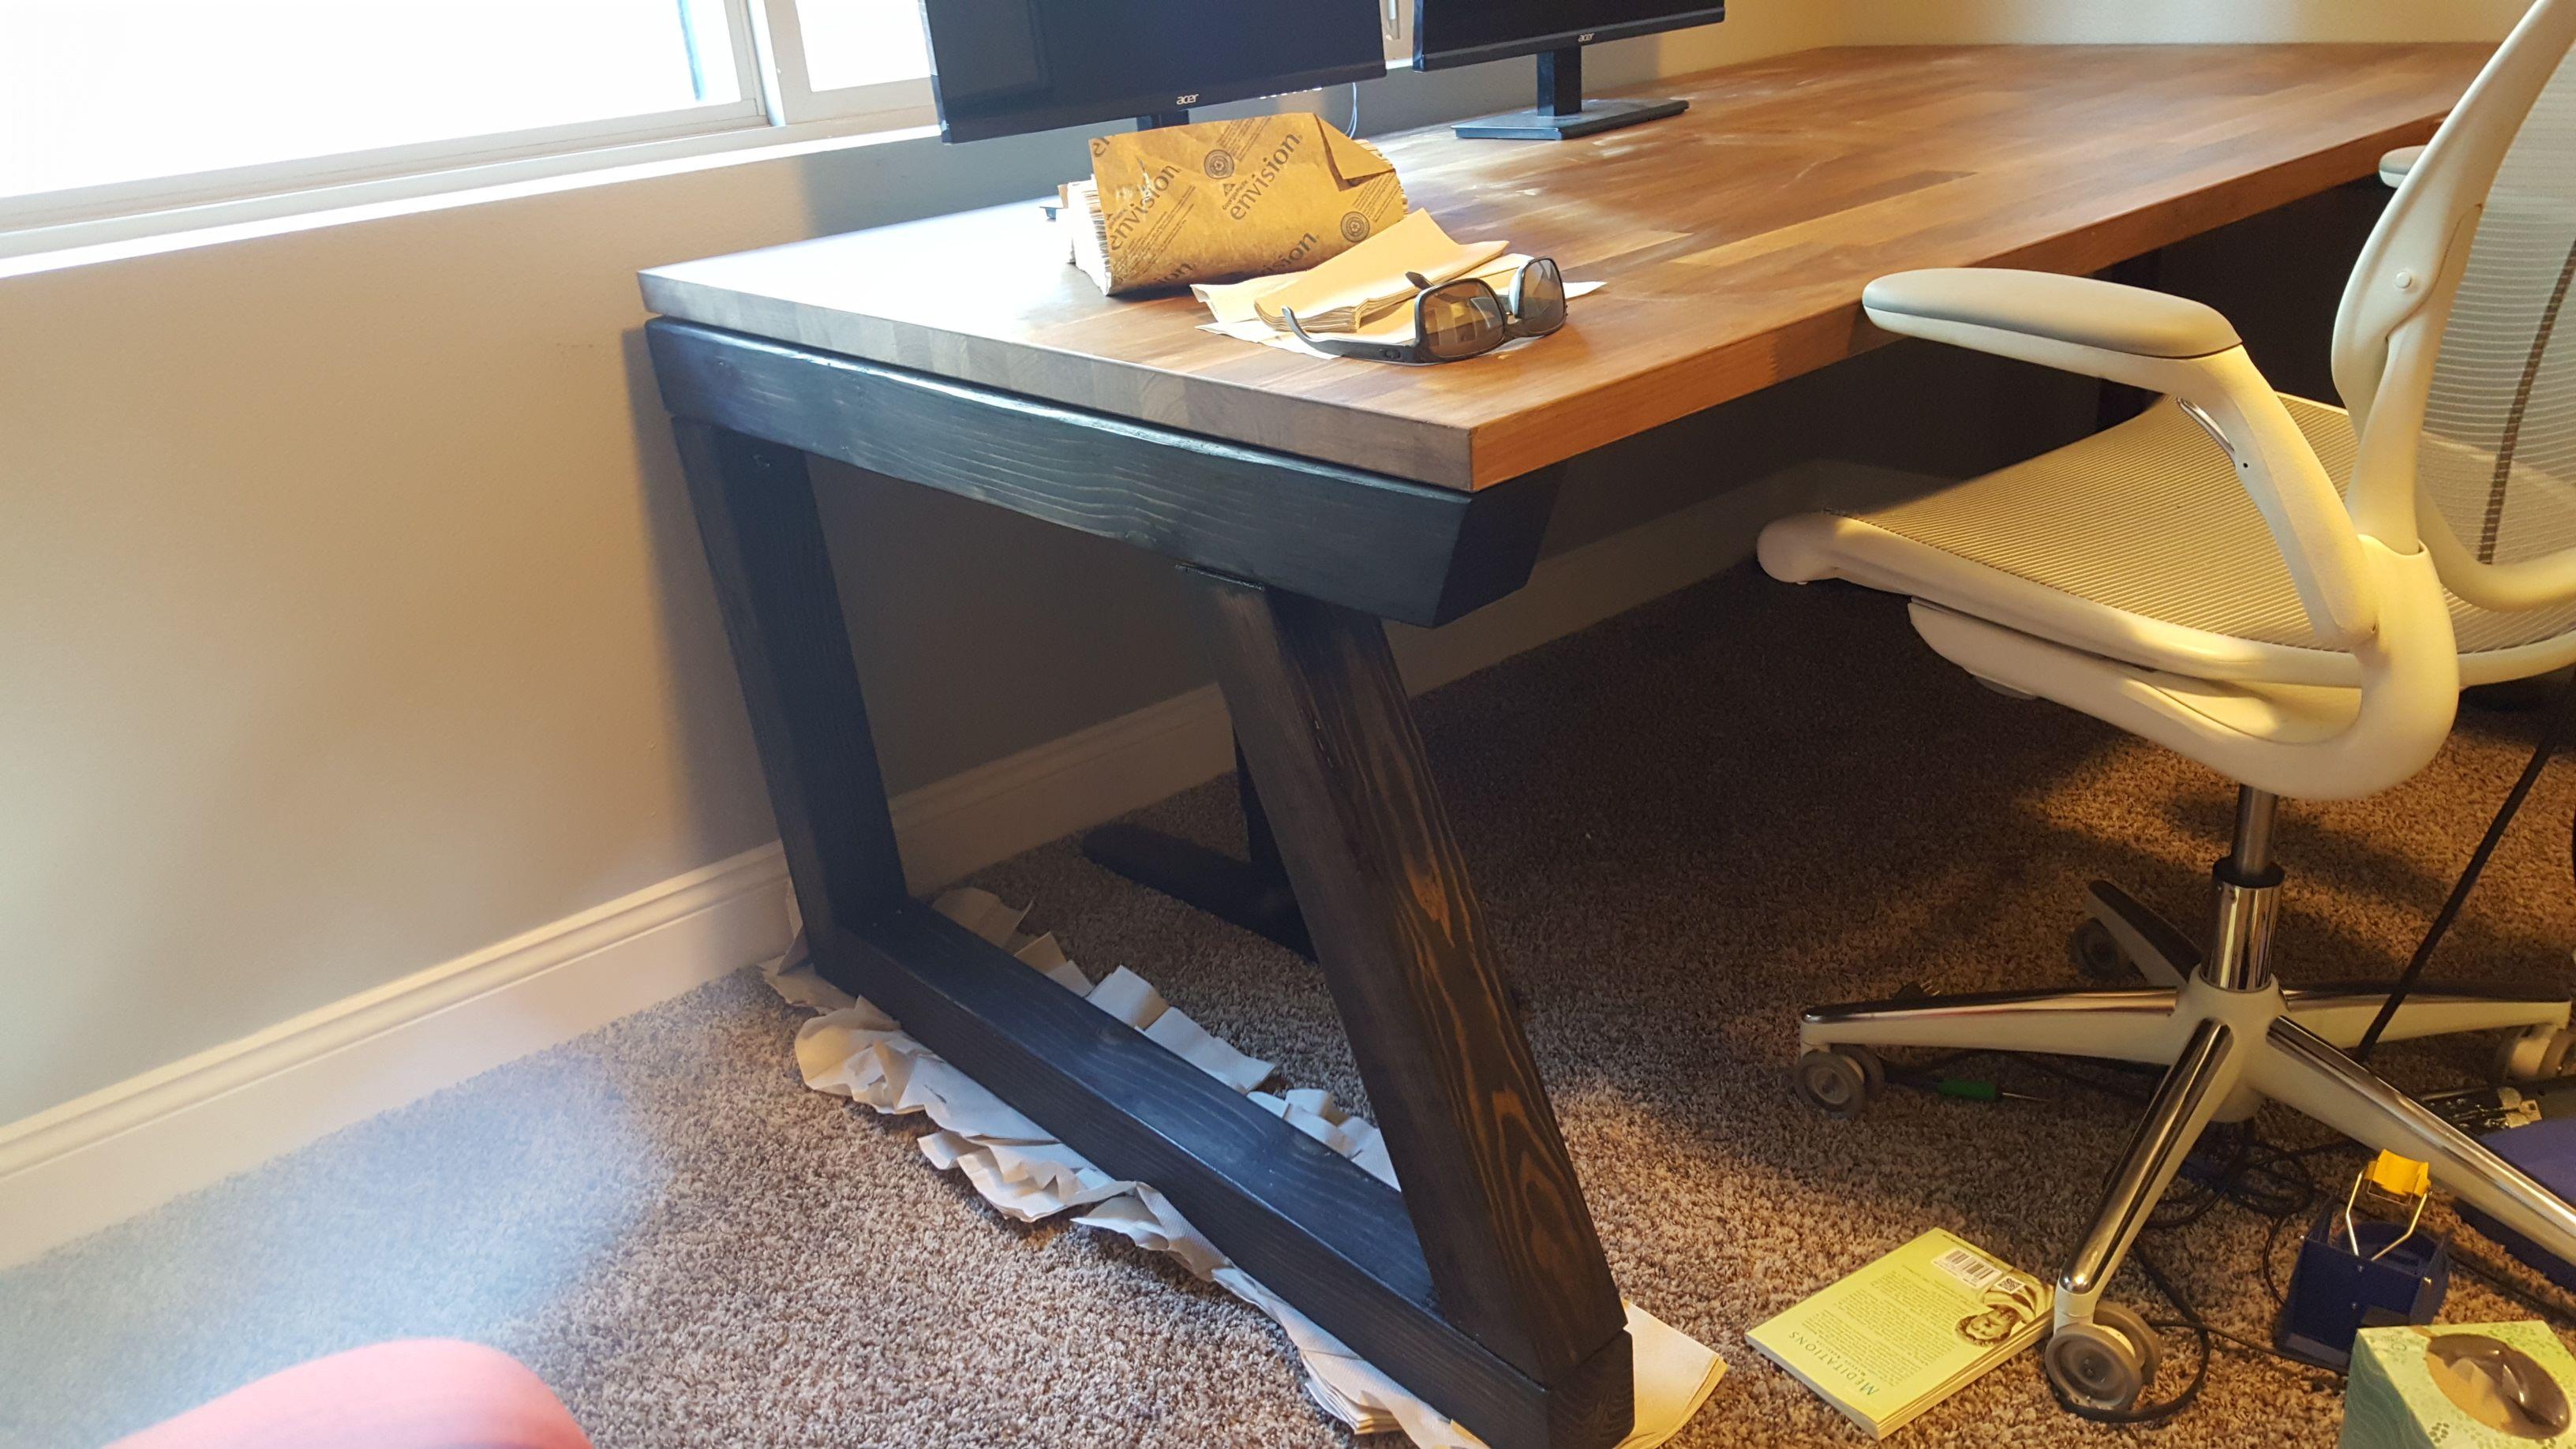 Diy Computer Desk Ikea Hack Countertop Desk Build It Yourself